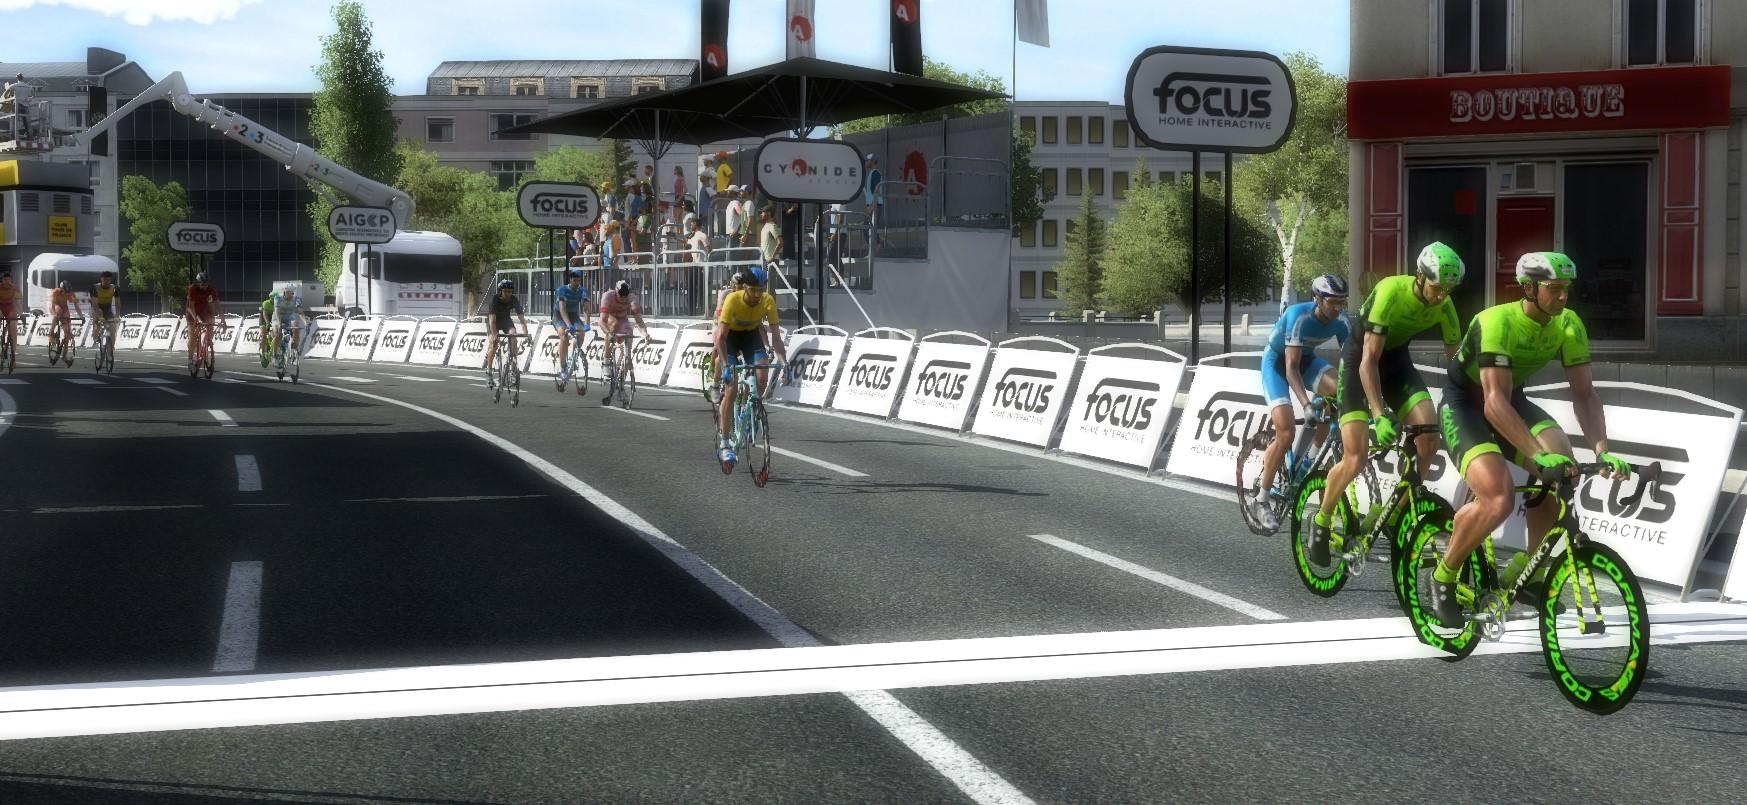 pcmdaily.com/images/mg/2019/Races/PT/PKP/422.jpg